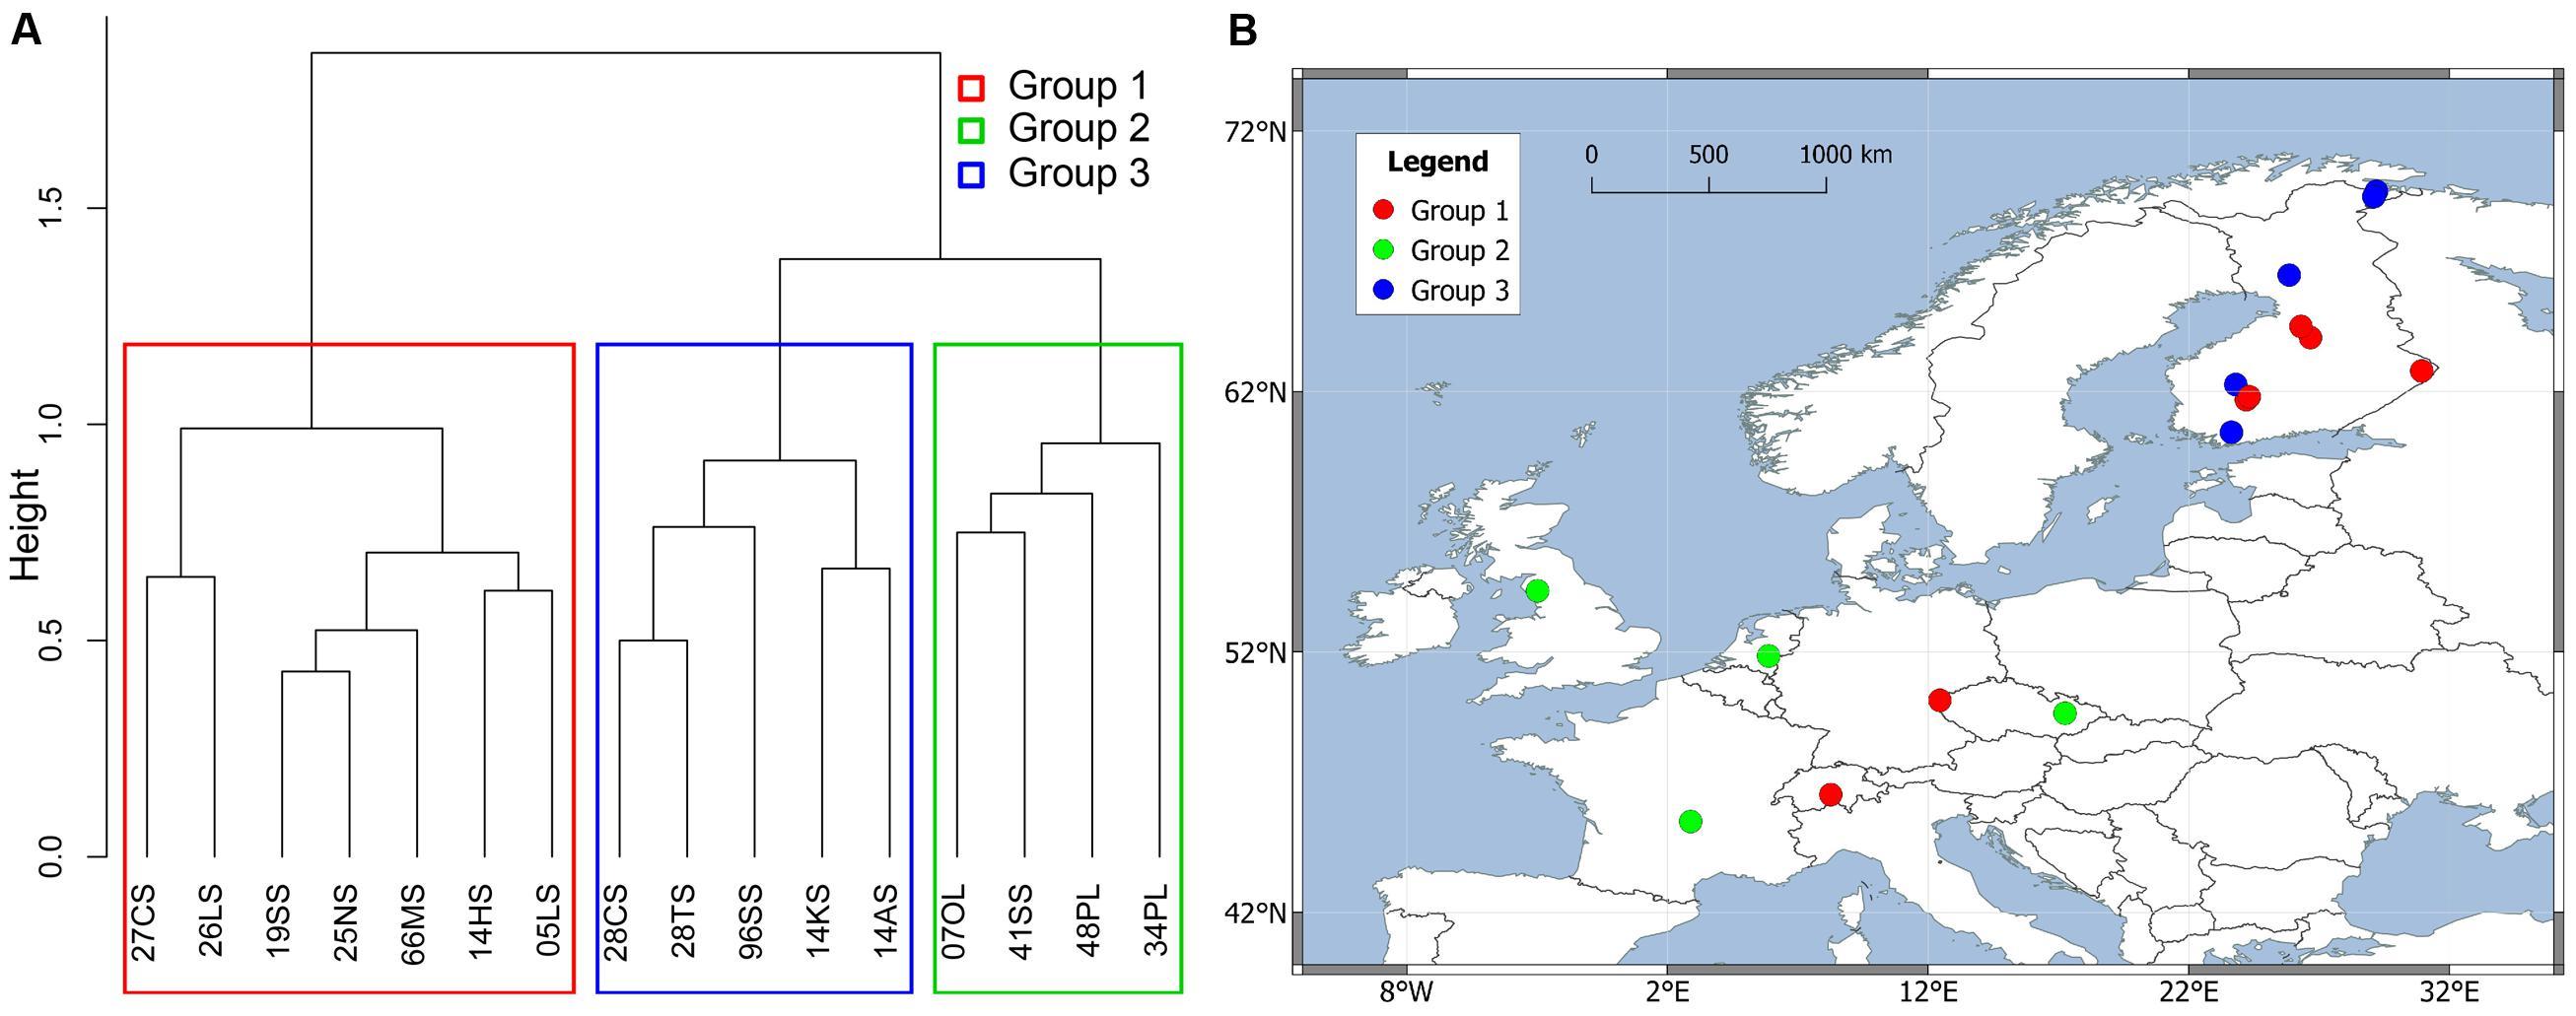 Identifying Natural Clusters Single Link Vs Complete Link